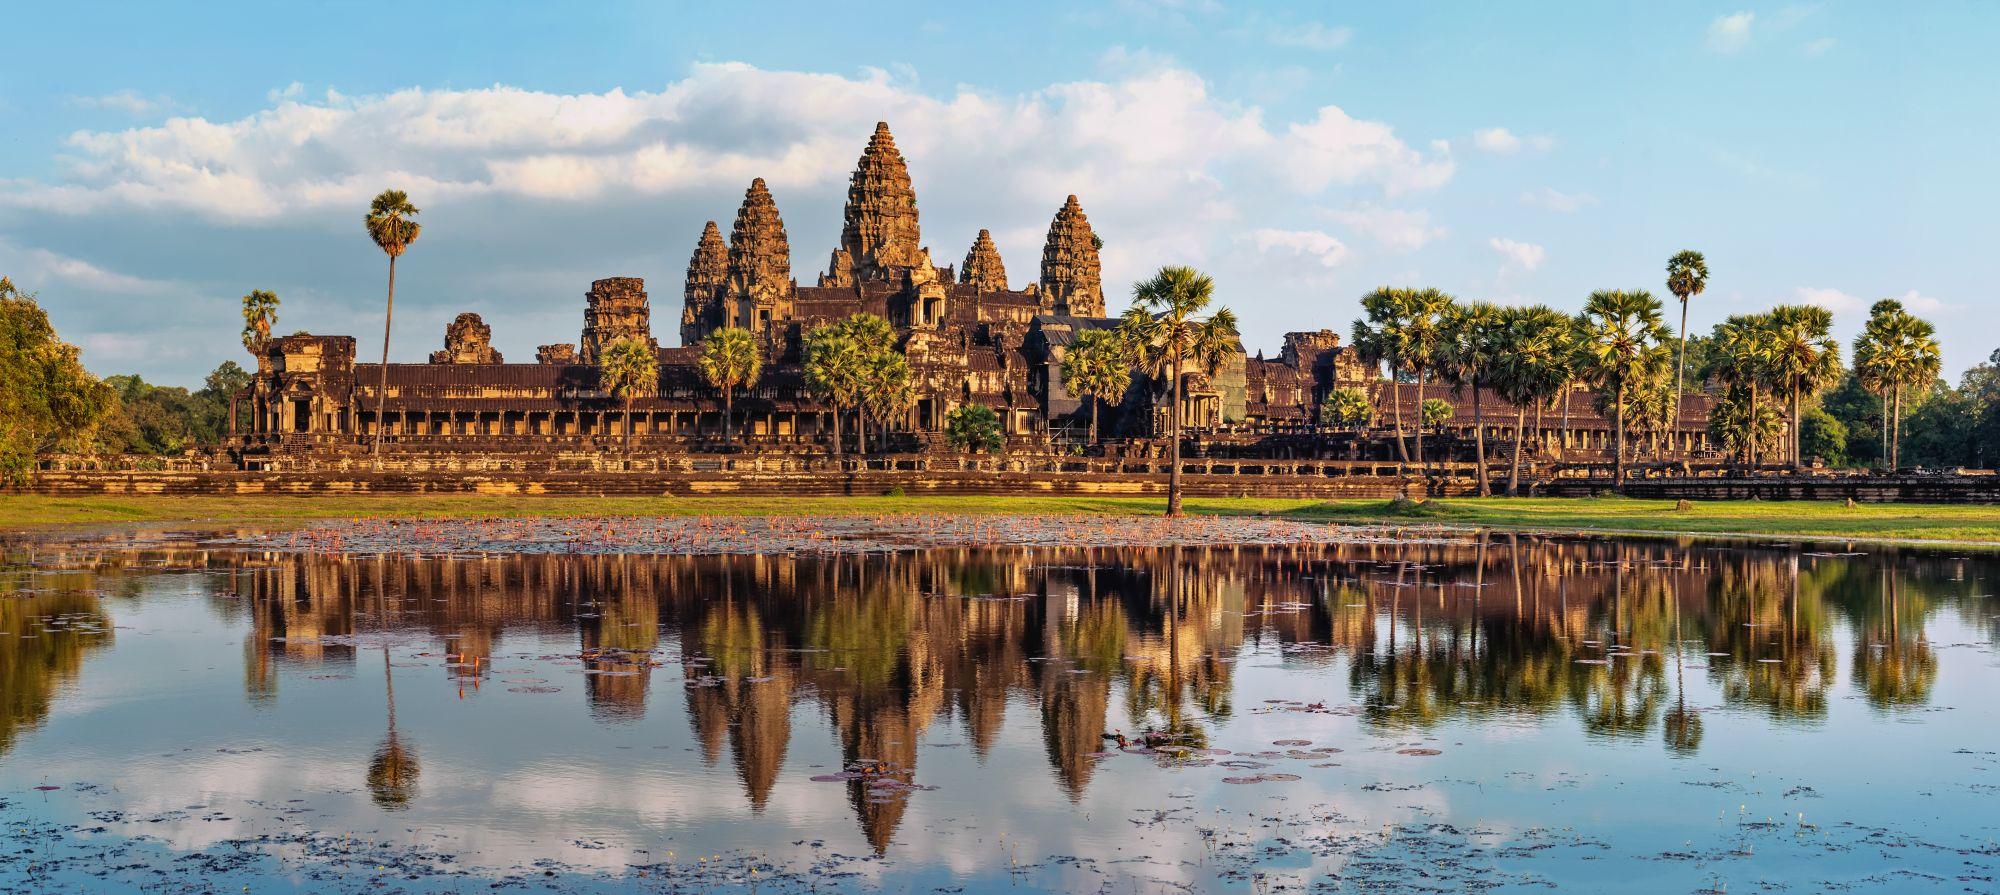 Cambodja Angkor Wat Khmer architectuur